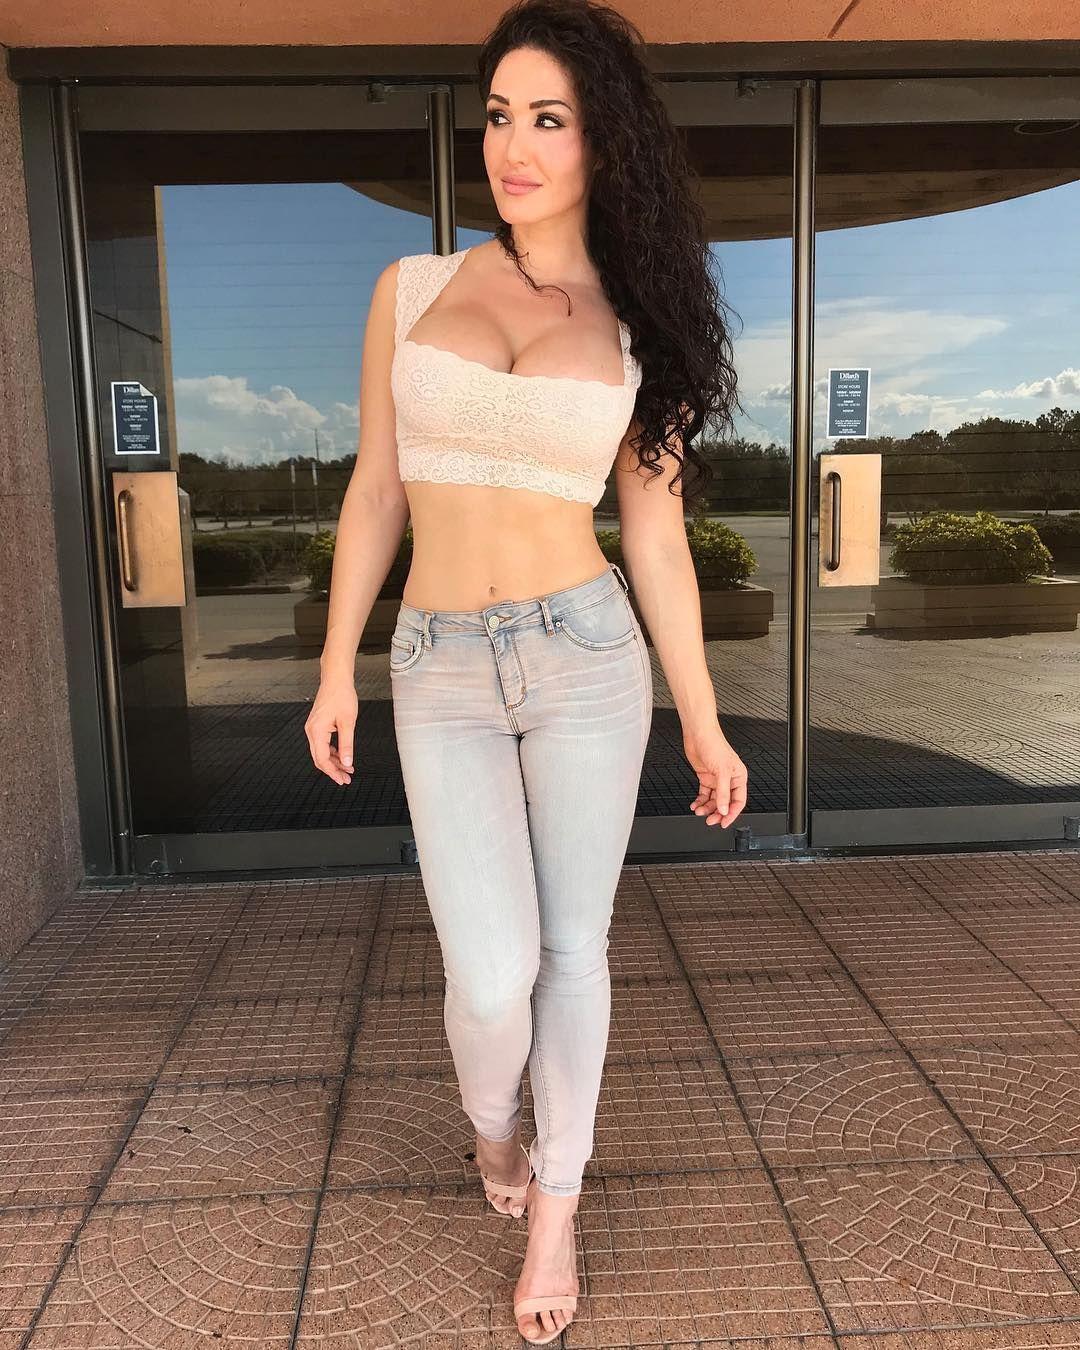 Instagram Gia Marie nude photos 2019